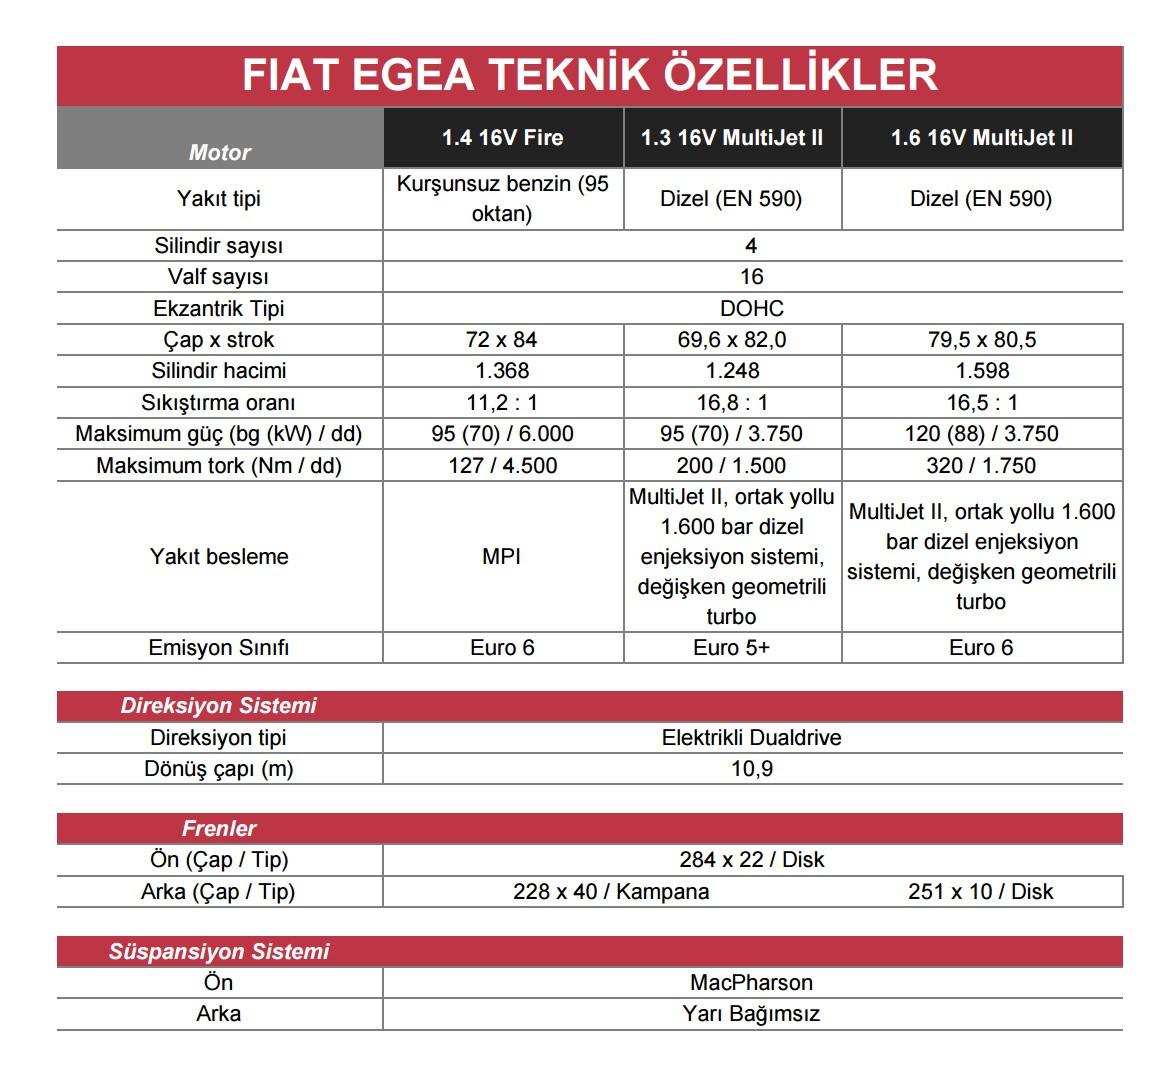 Yeni-Fiat-Egea-teknik-ozellikler-01.jpg